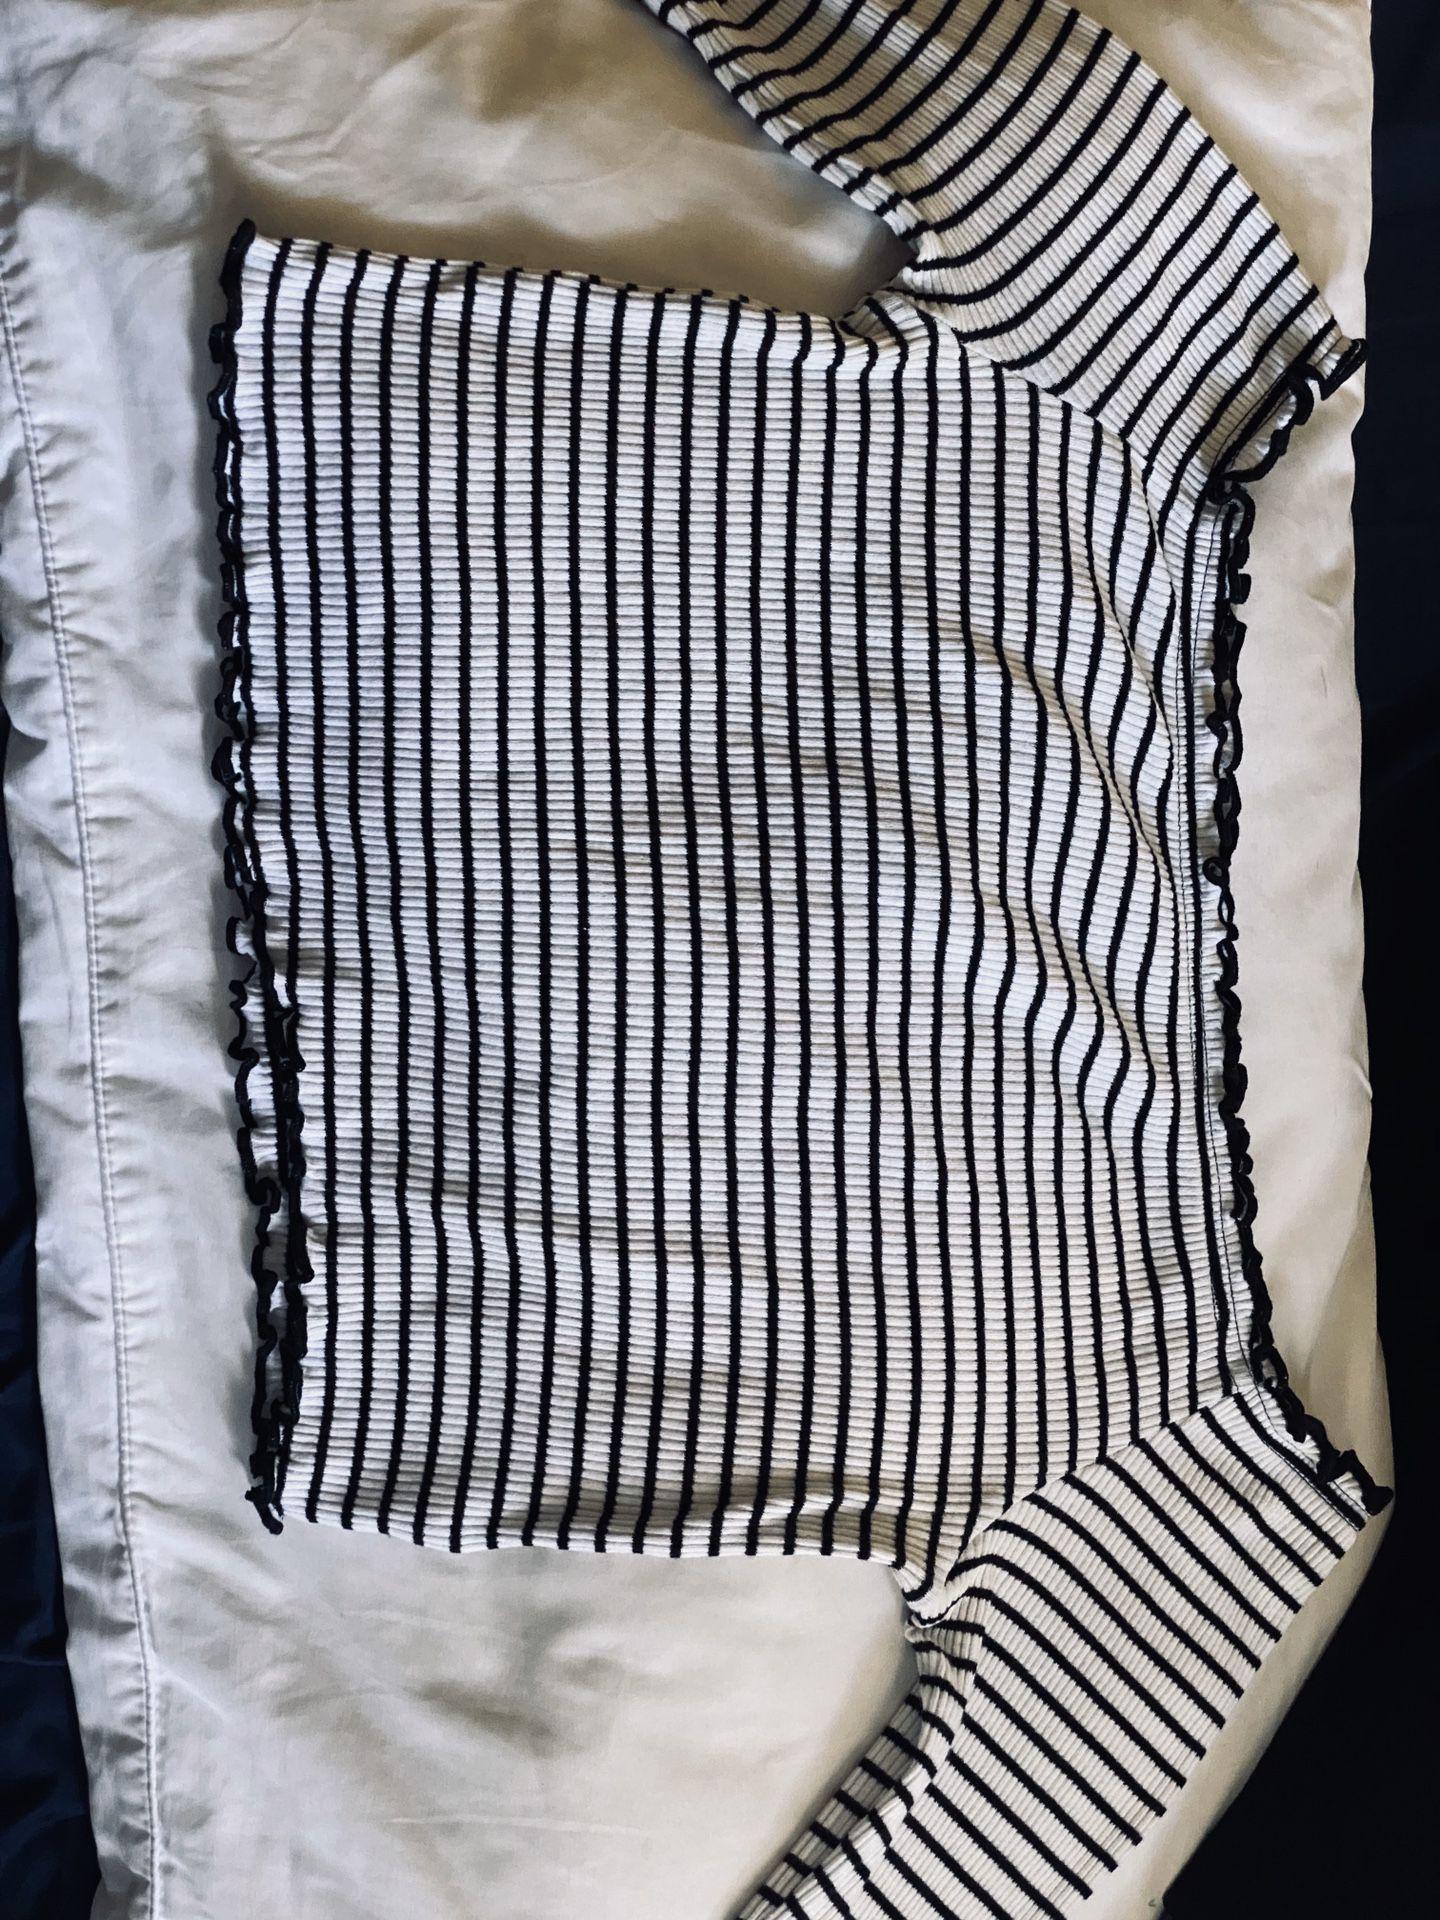 Black & white shirt